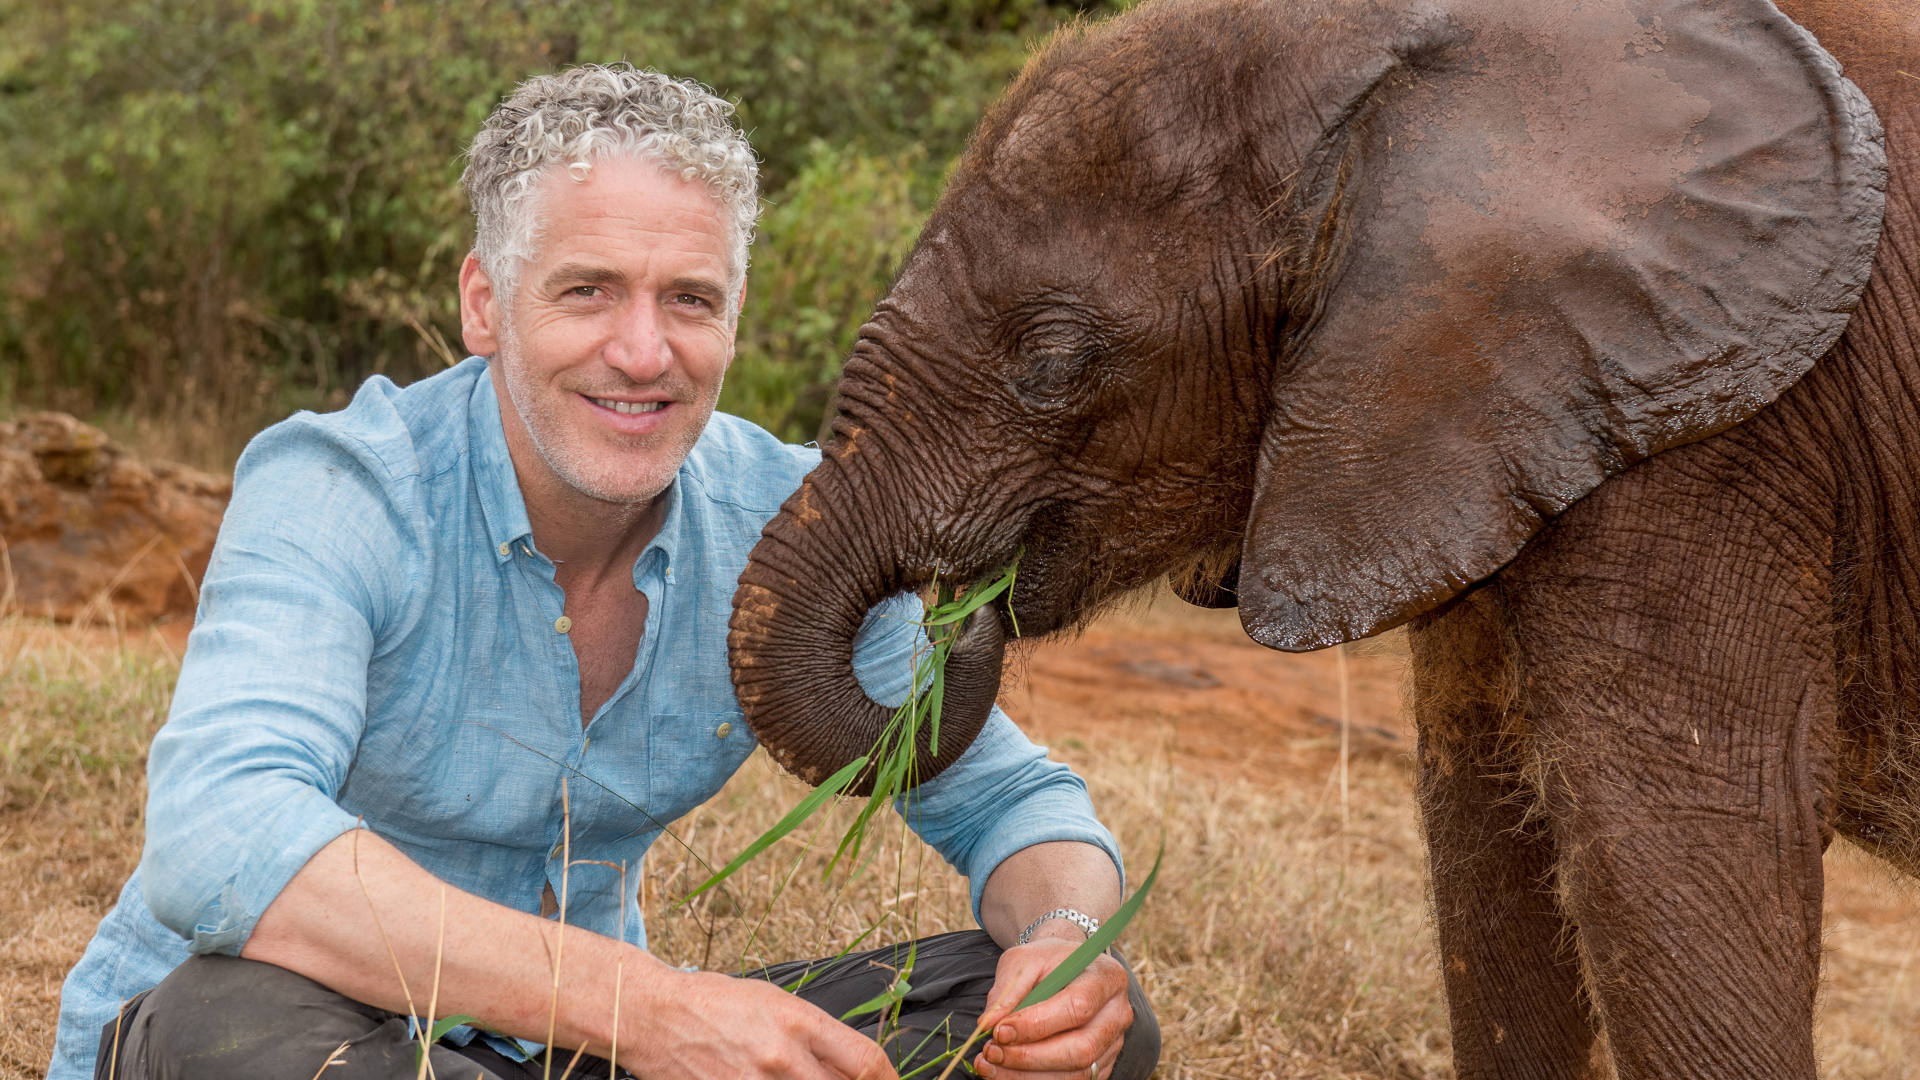 Gordon Buchanan feeding grass to a baby elephant